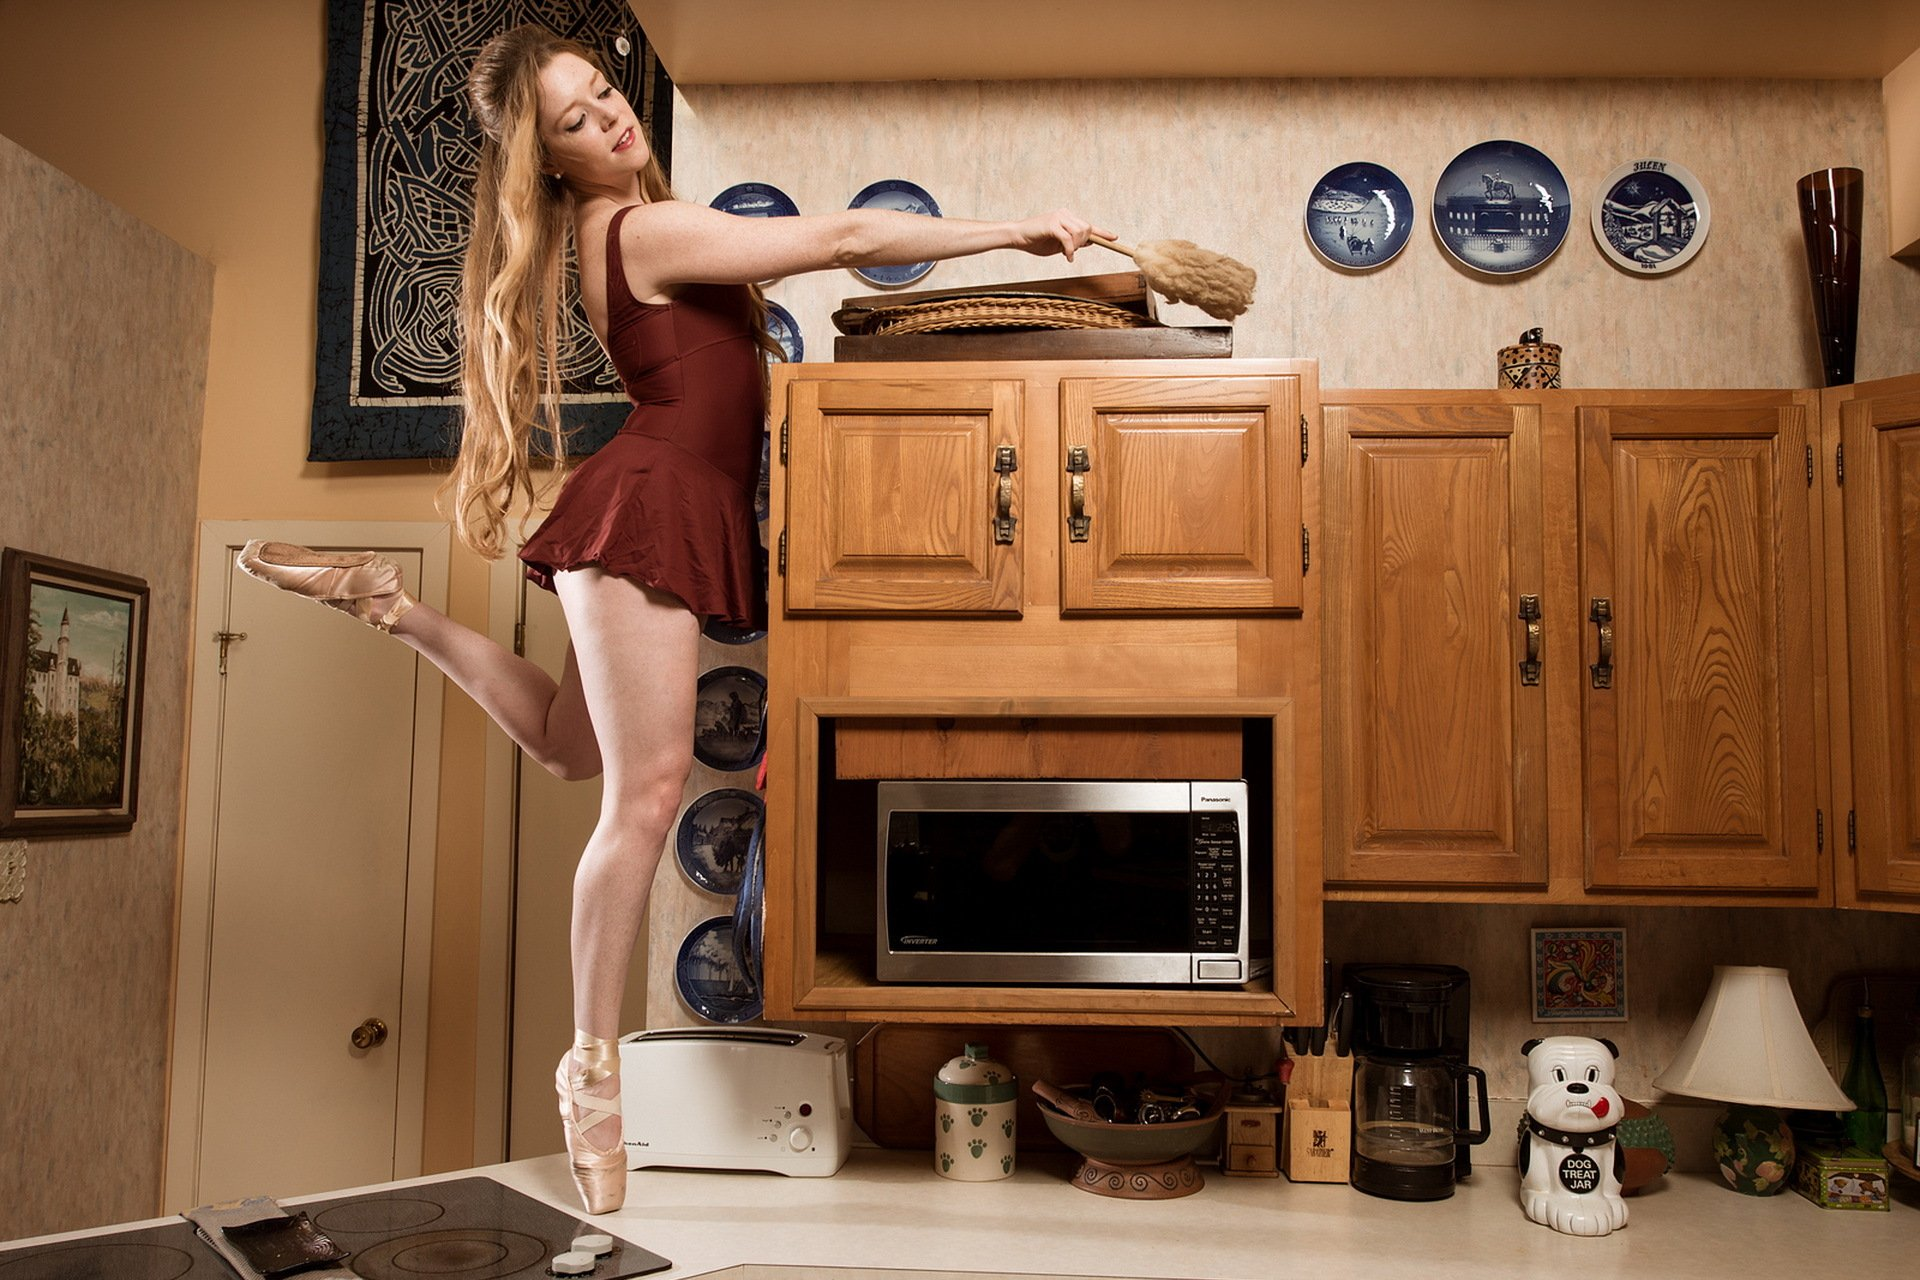 Кухонном быстрый перепехон столе на